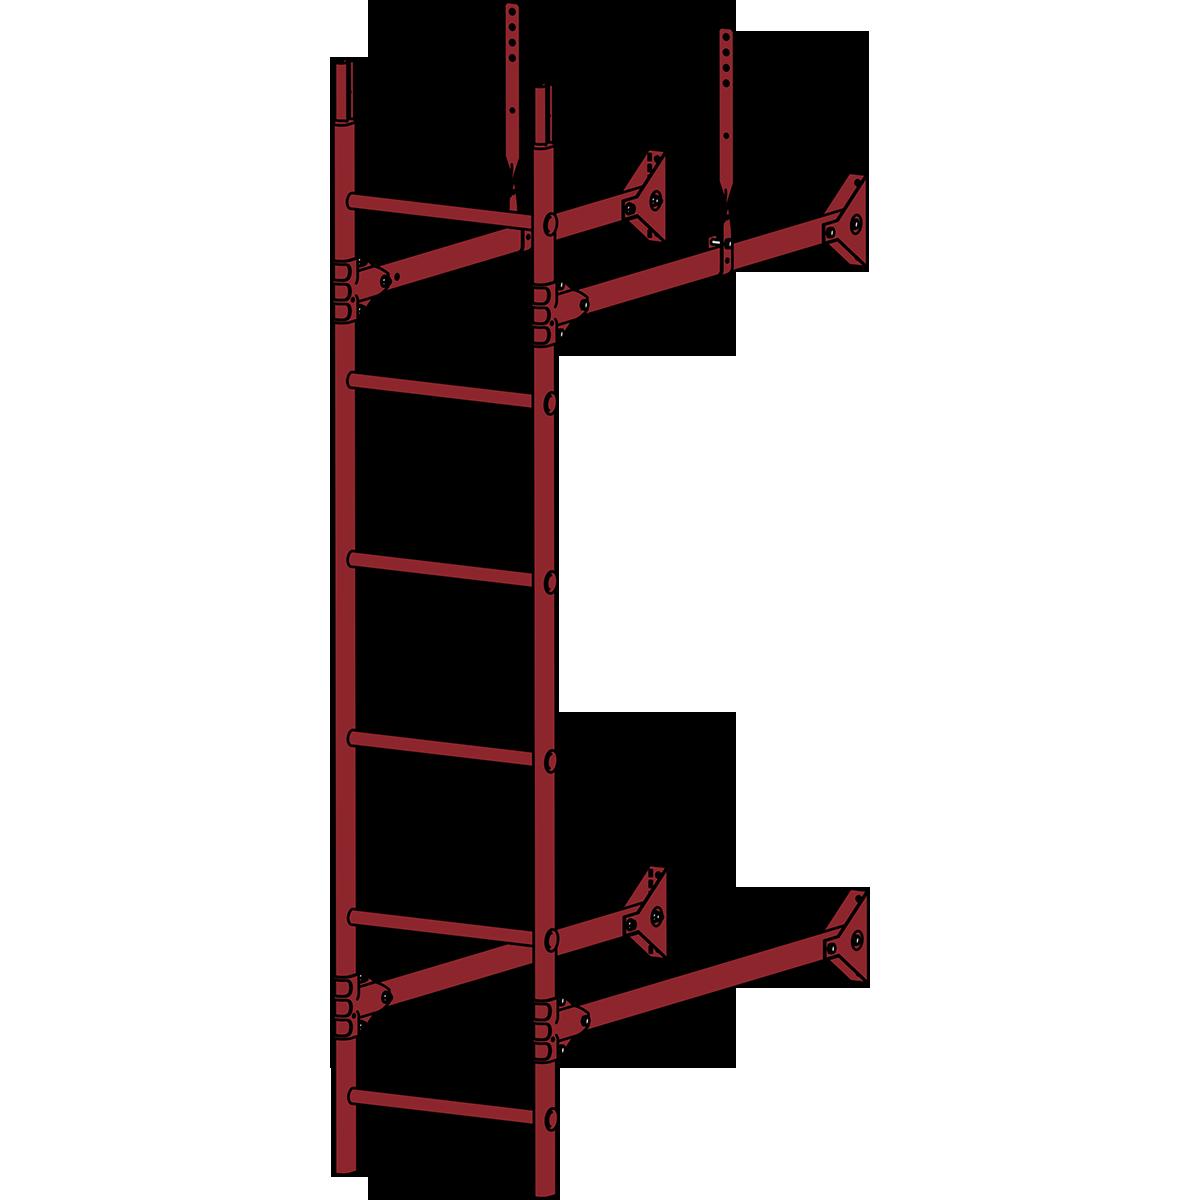 Лестница стеновая ROOFSYSTEMS PRESTIGE ZN 3м RAL 3011 Коричнево-красный